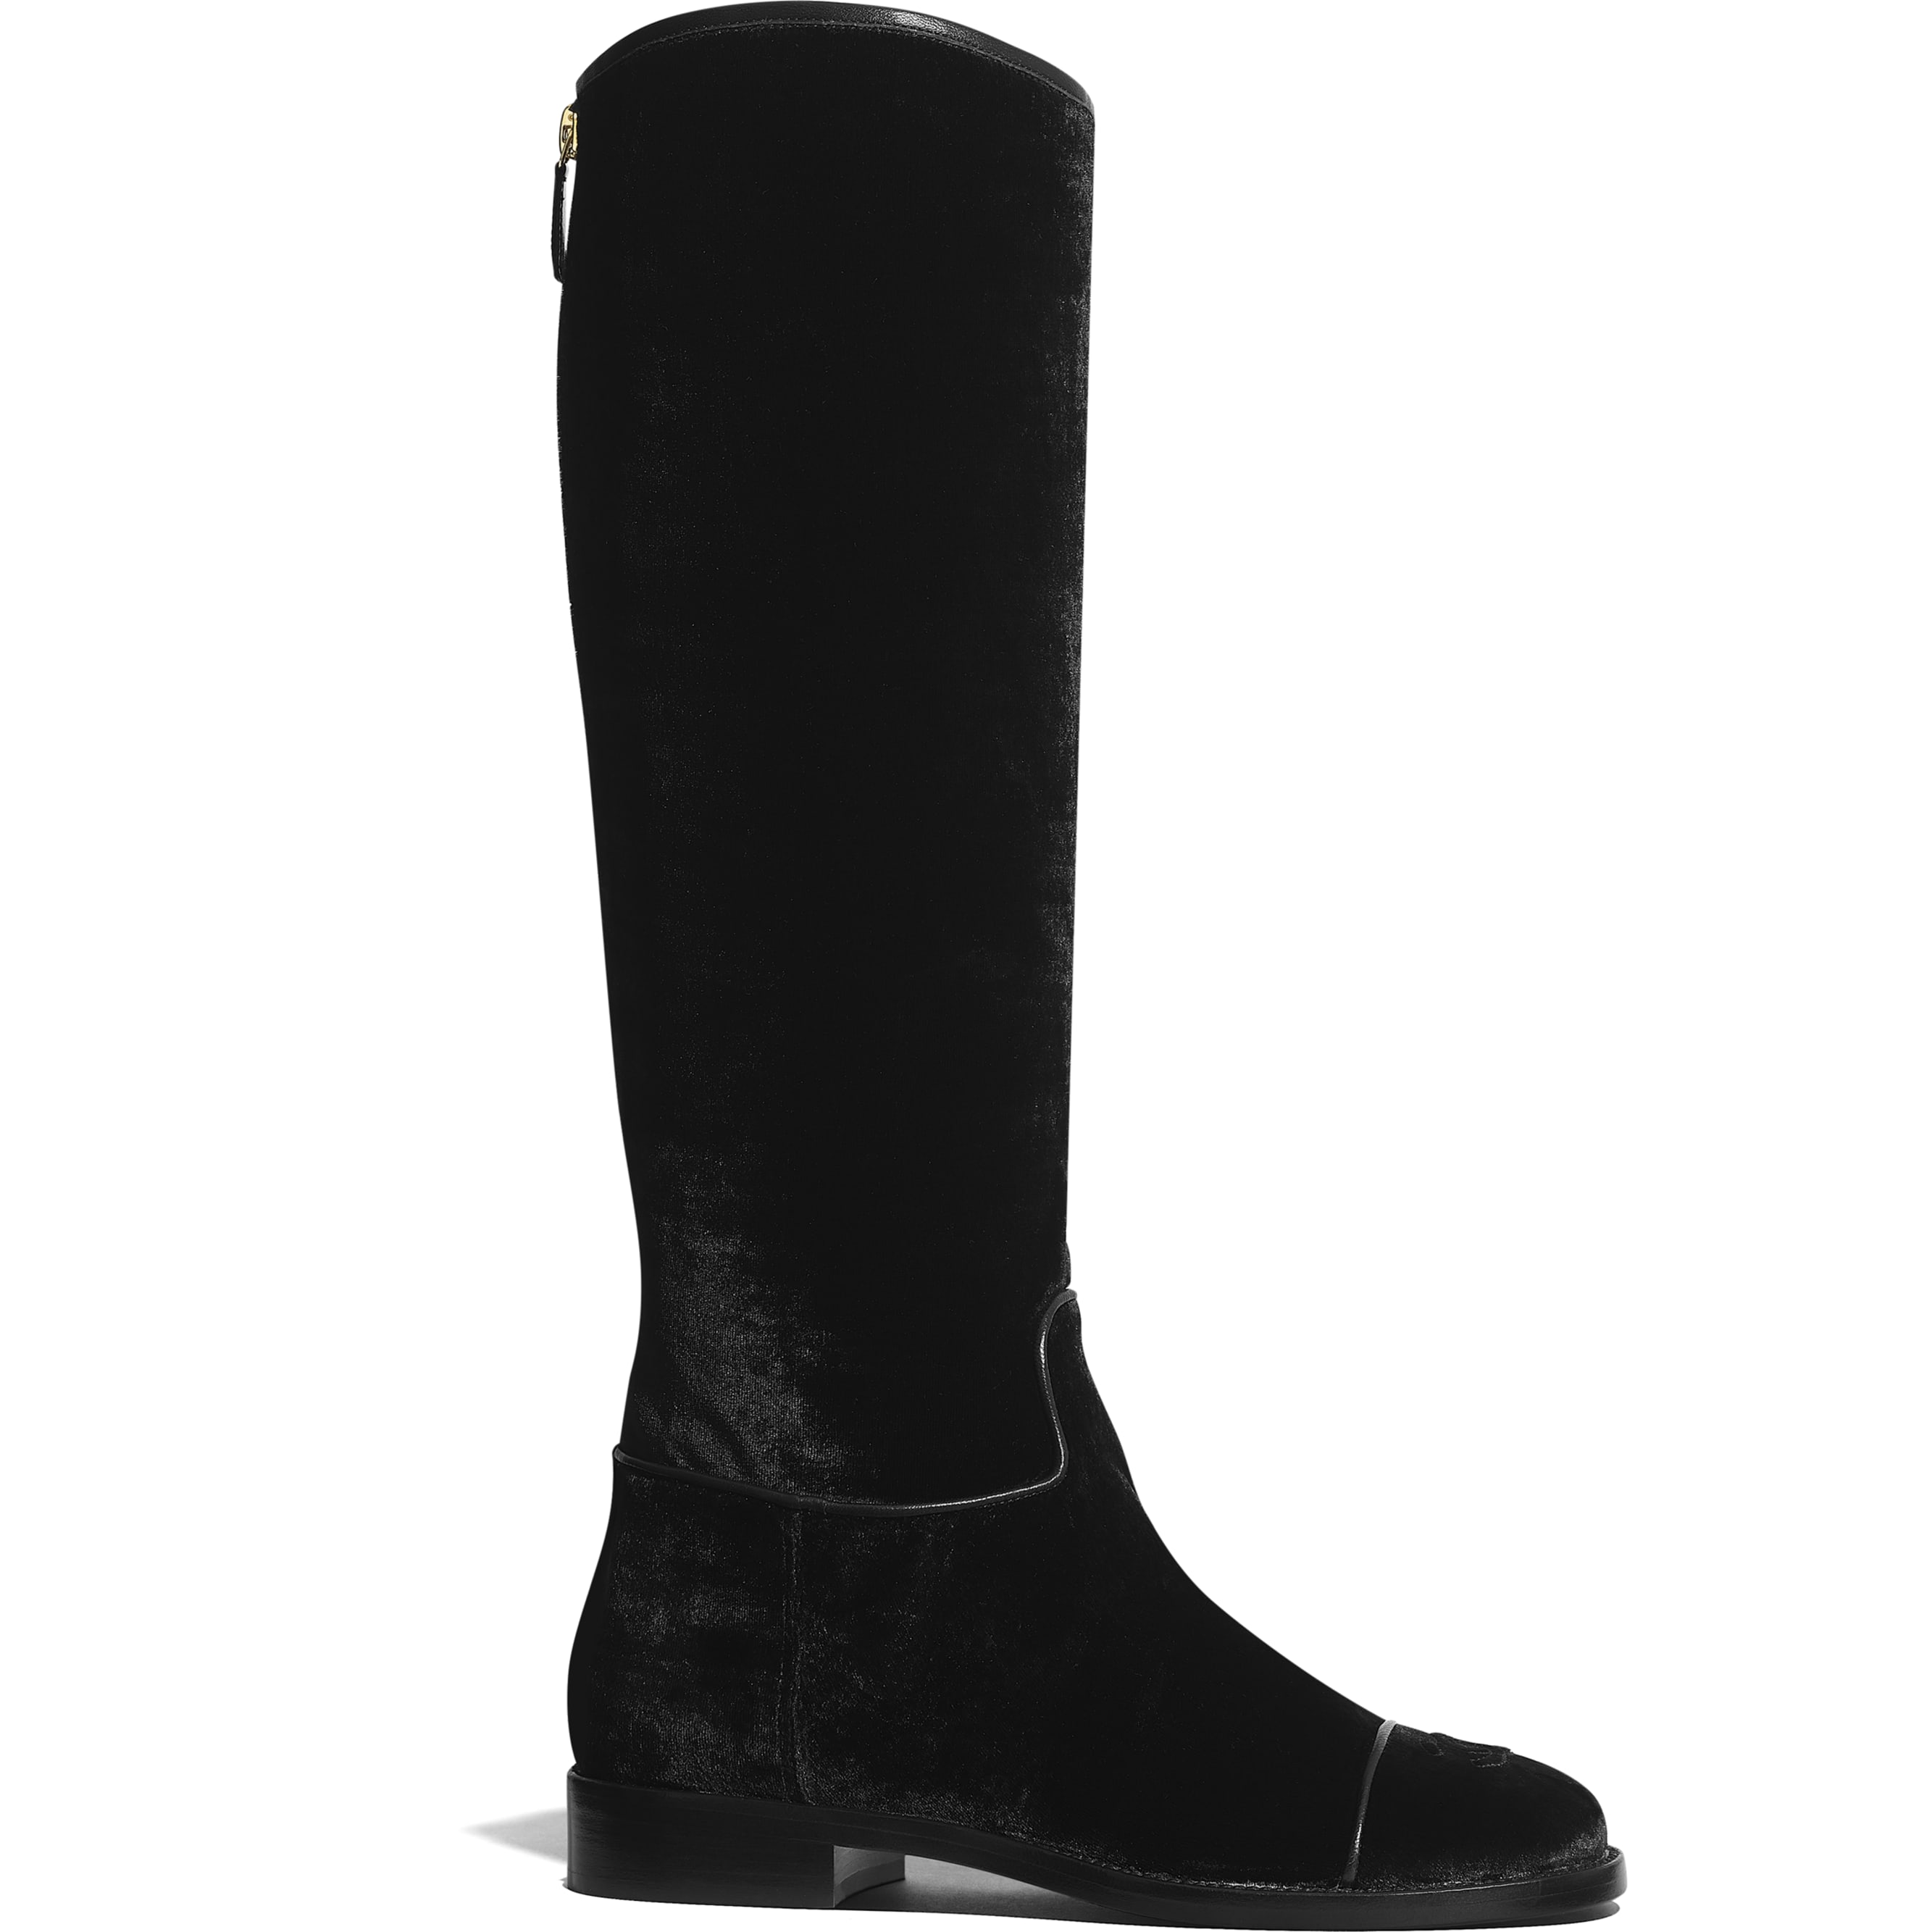 High Boots - Black - Velvet - Default view - see standard sized version